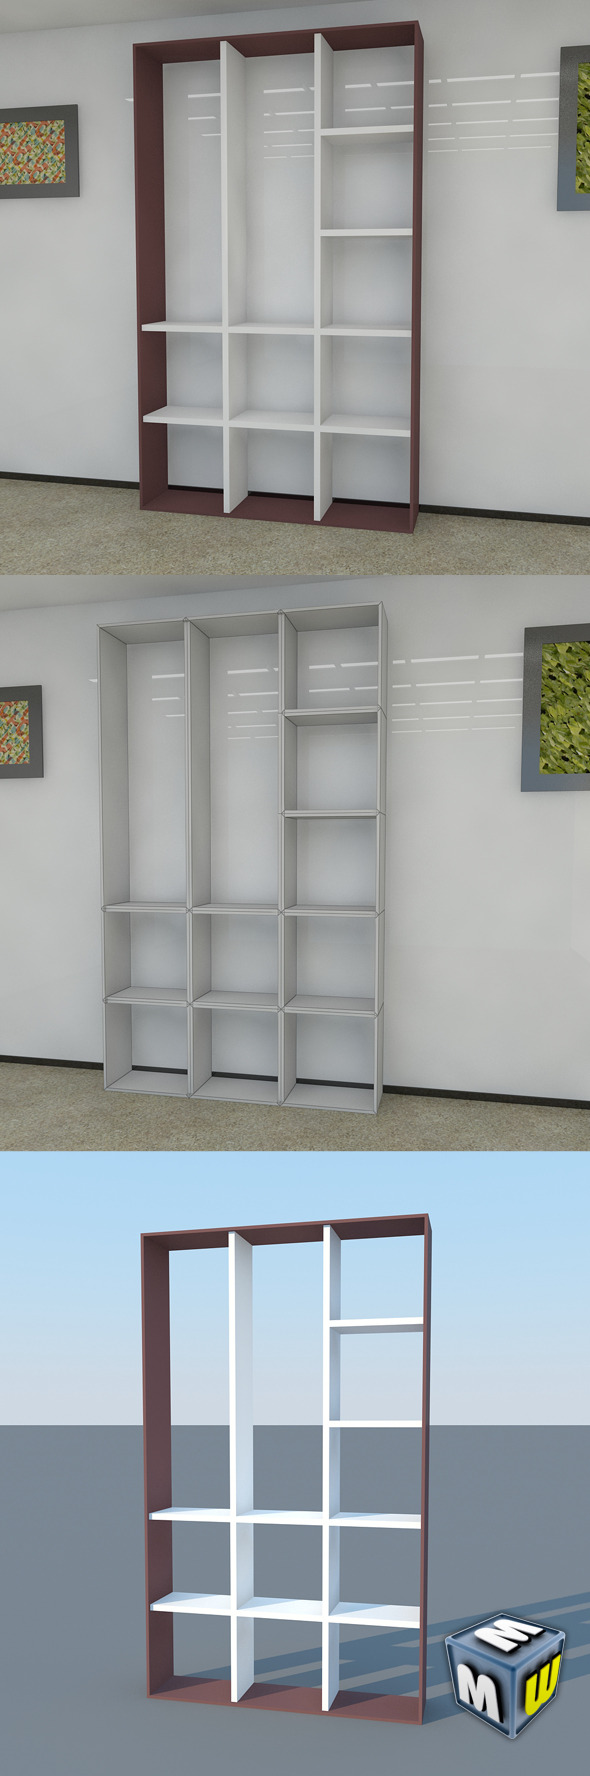 Bookshelf 15 MAX 2011 - 3DOcean Item for Sale